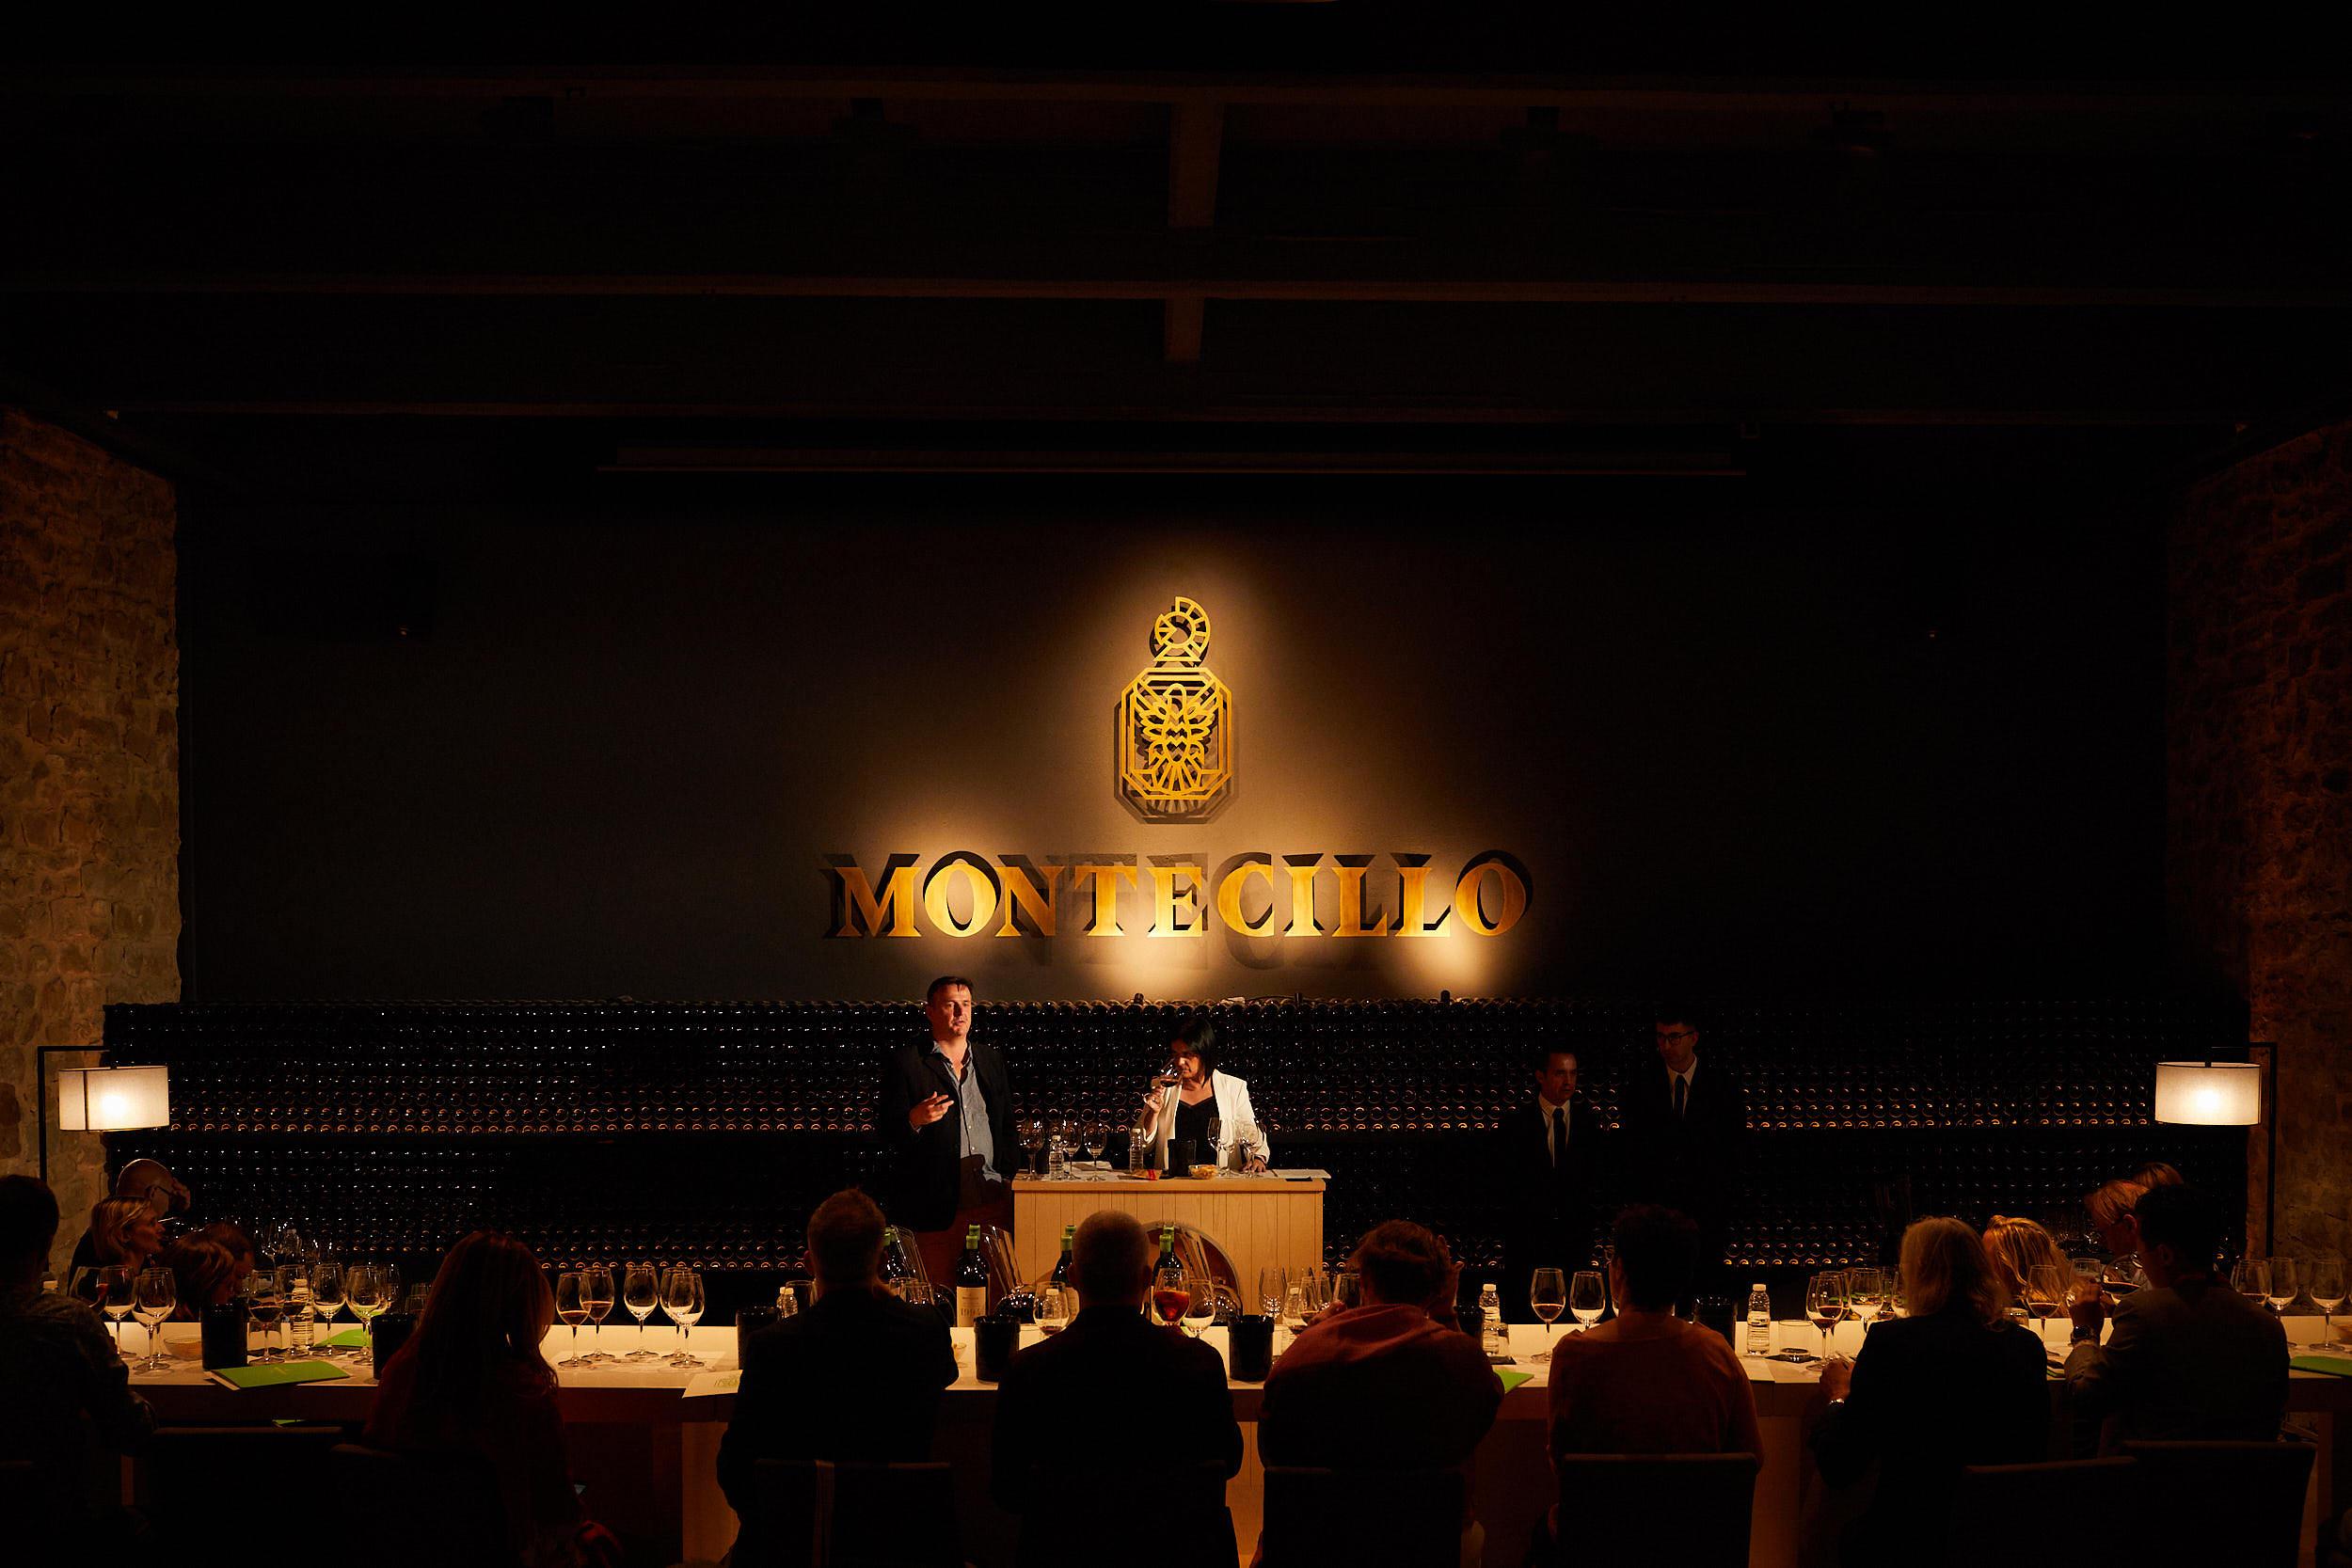 1806Basque_Country_Rioja_Spain_Wine_Photographer_James_Sturcke_0038.jpg